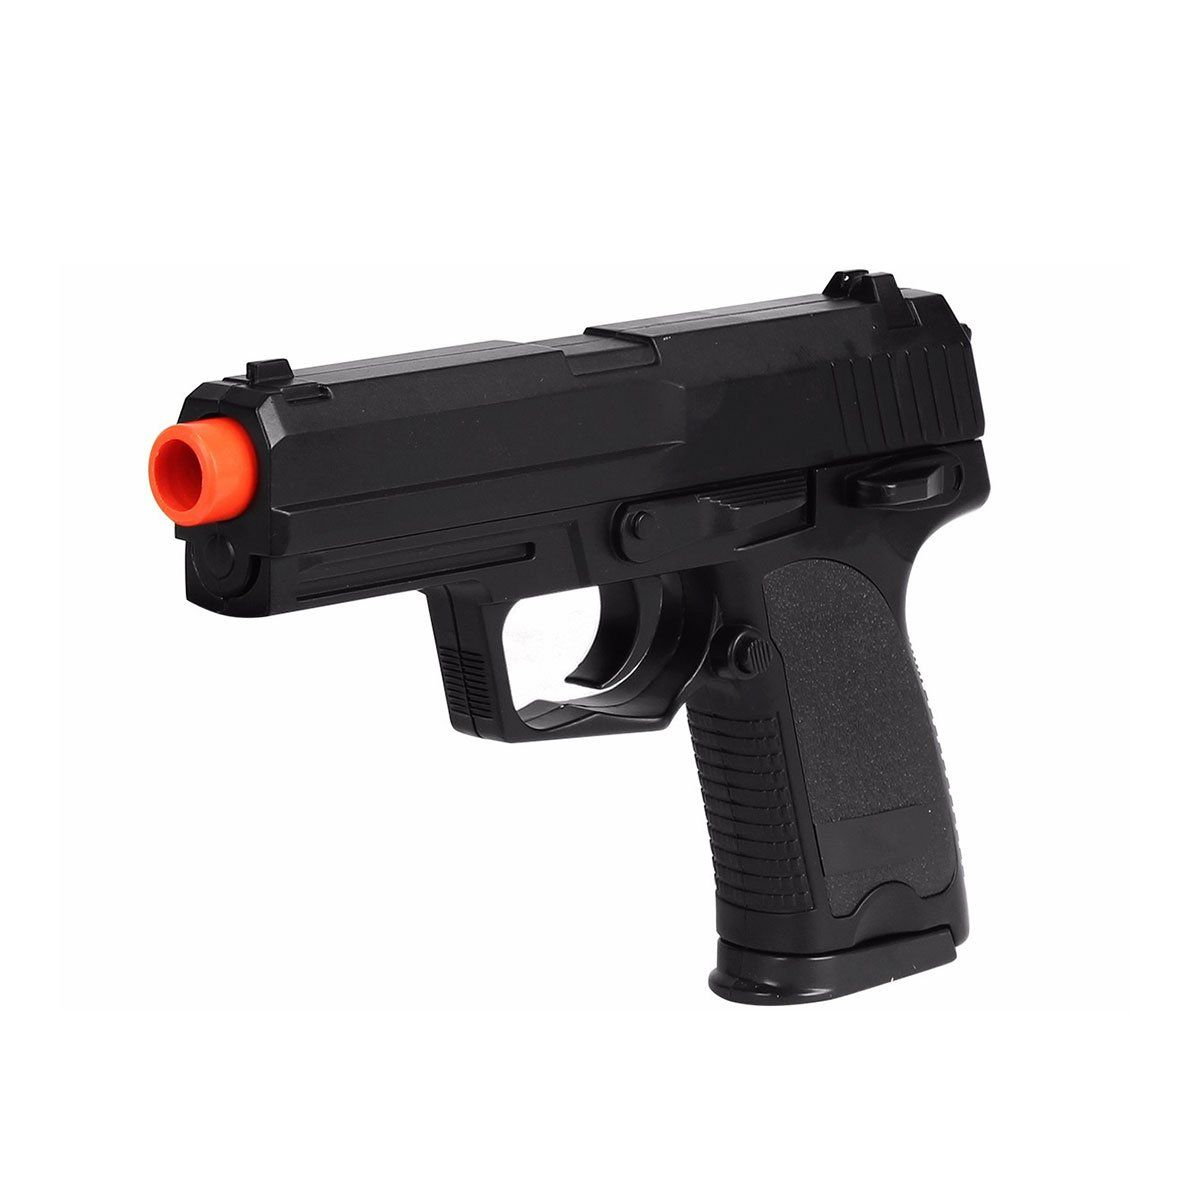 Pistola de Airsoft Cyma ZM20 Full Metal Spring 6mm